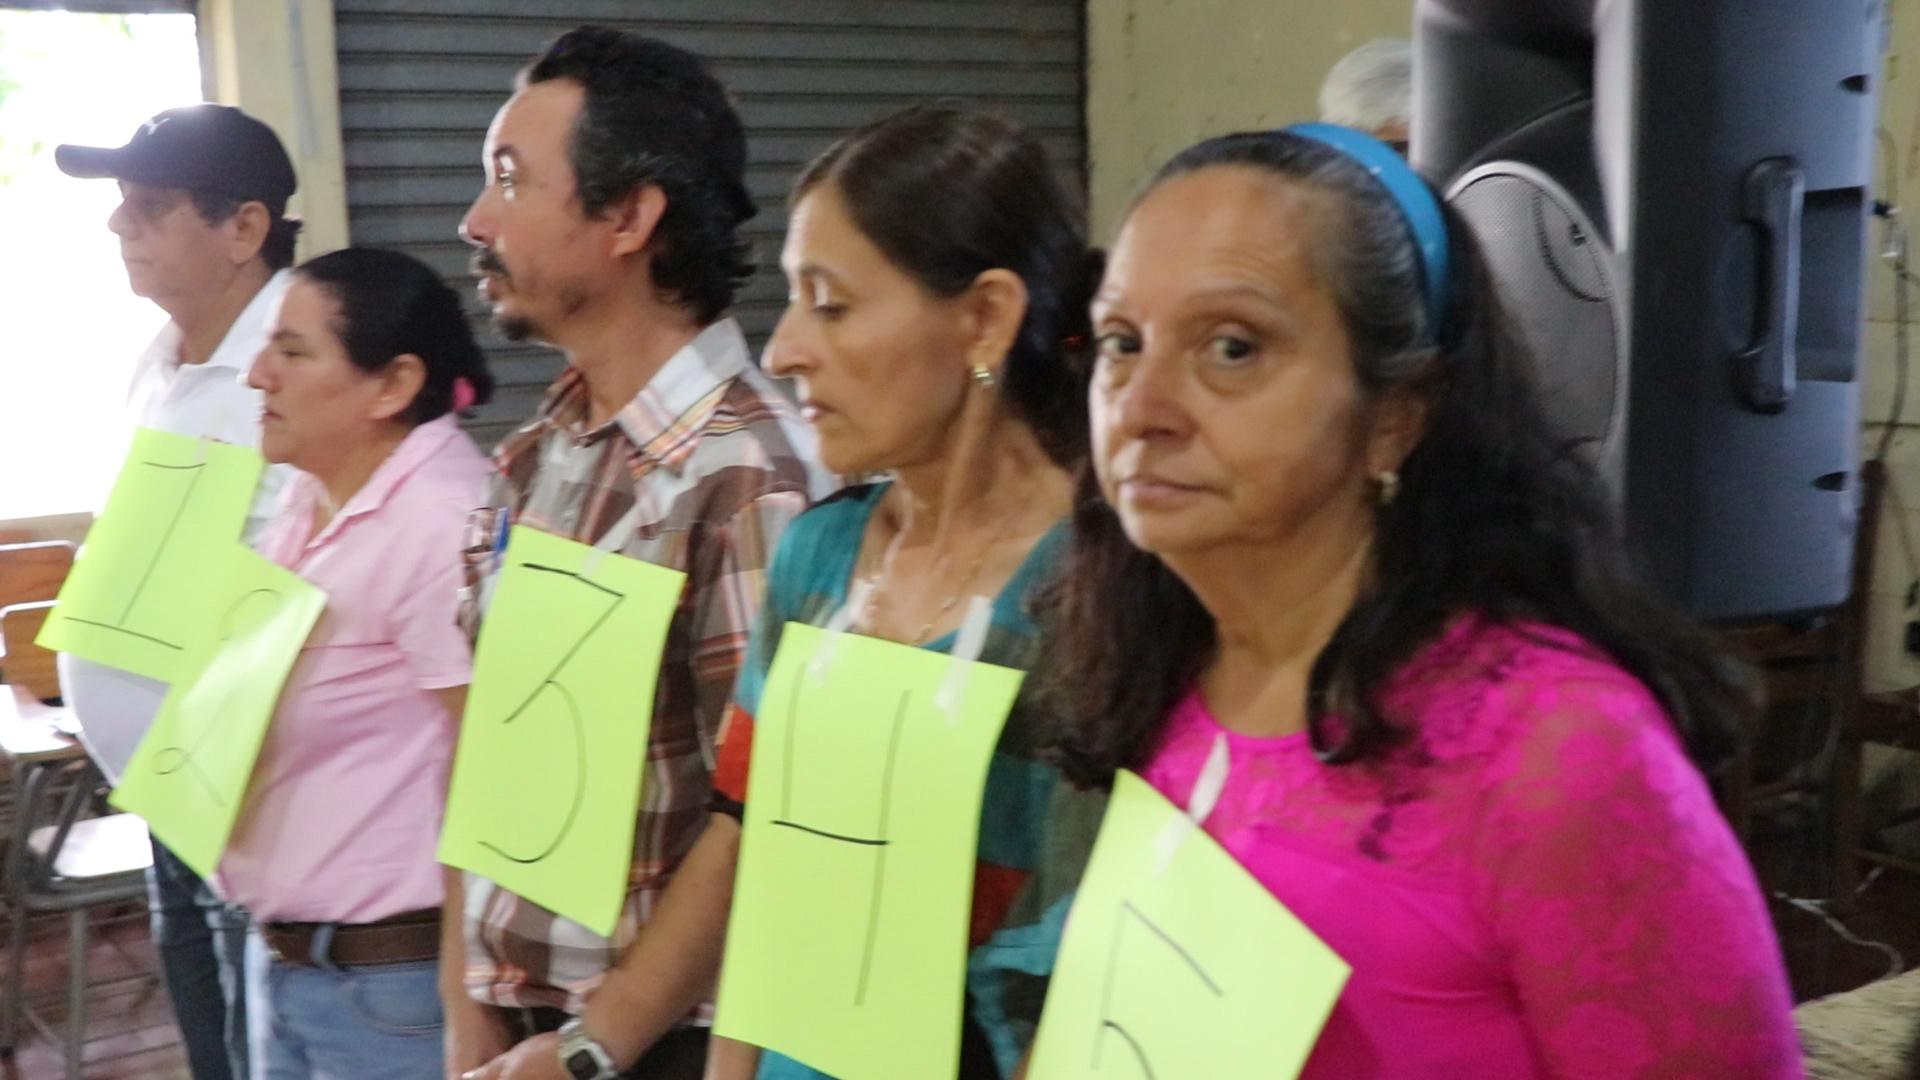 Eleccion Junta  11 Agosto 2017 07.jpg